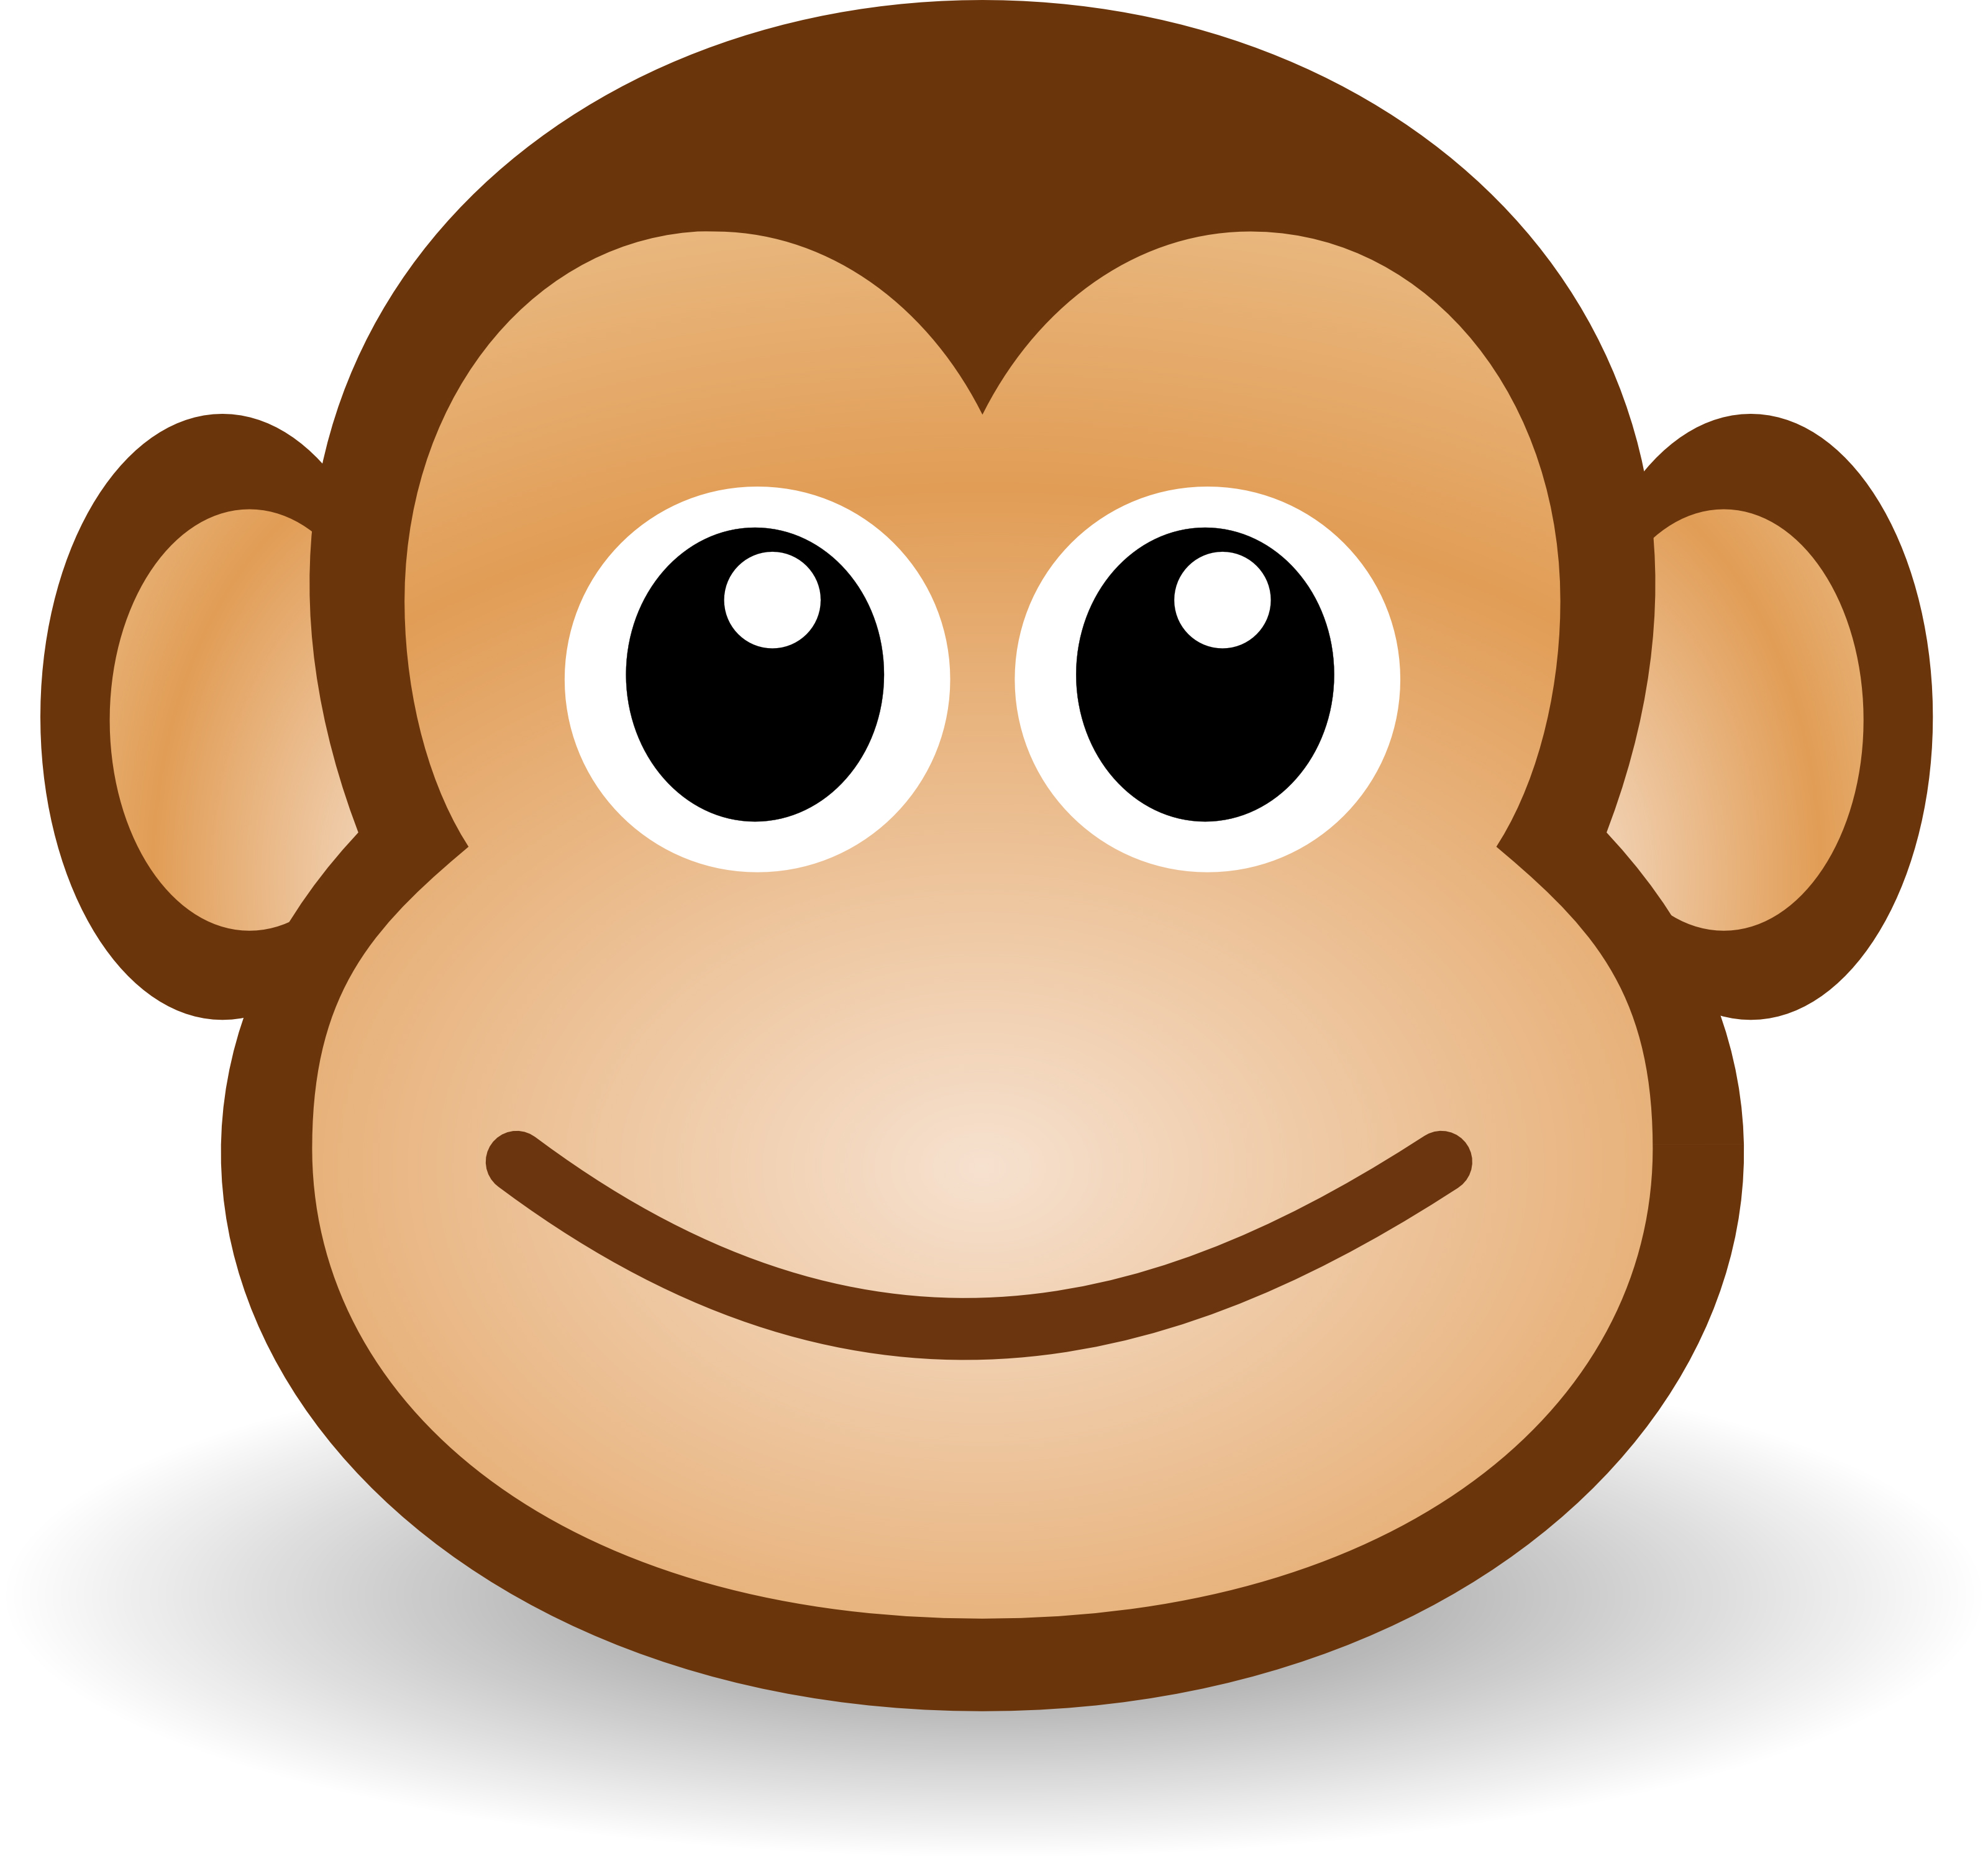 3200x2990 Free Cute Cartoon Monkey Clipart Illustration